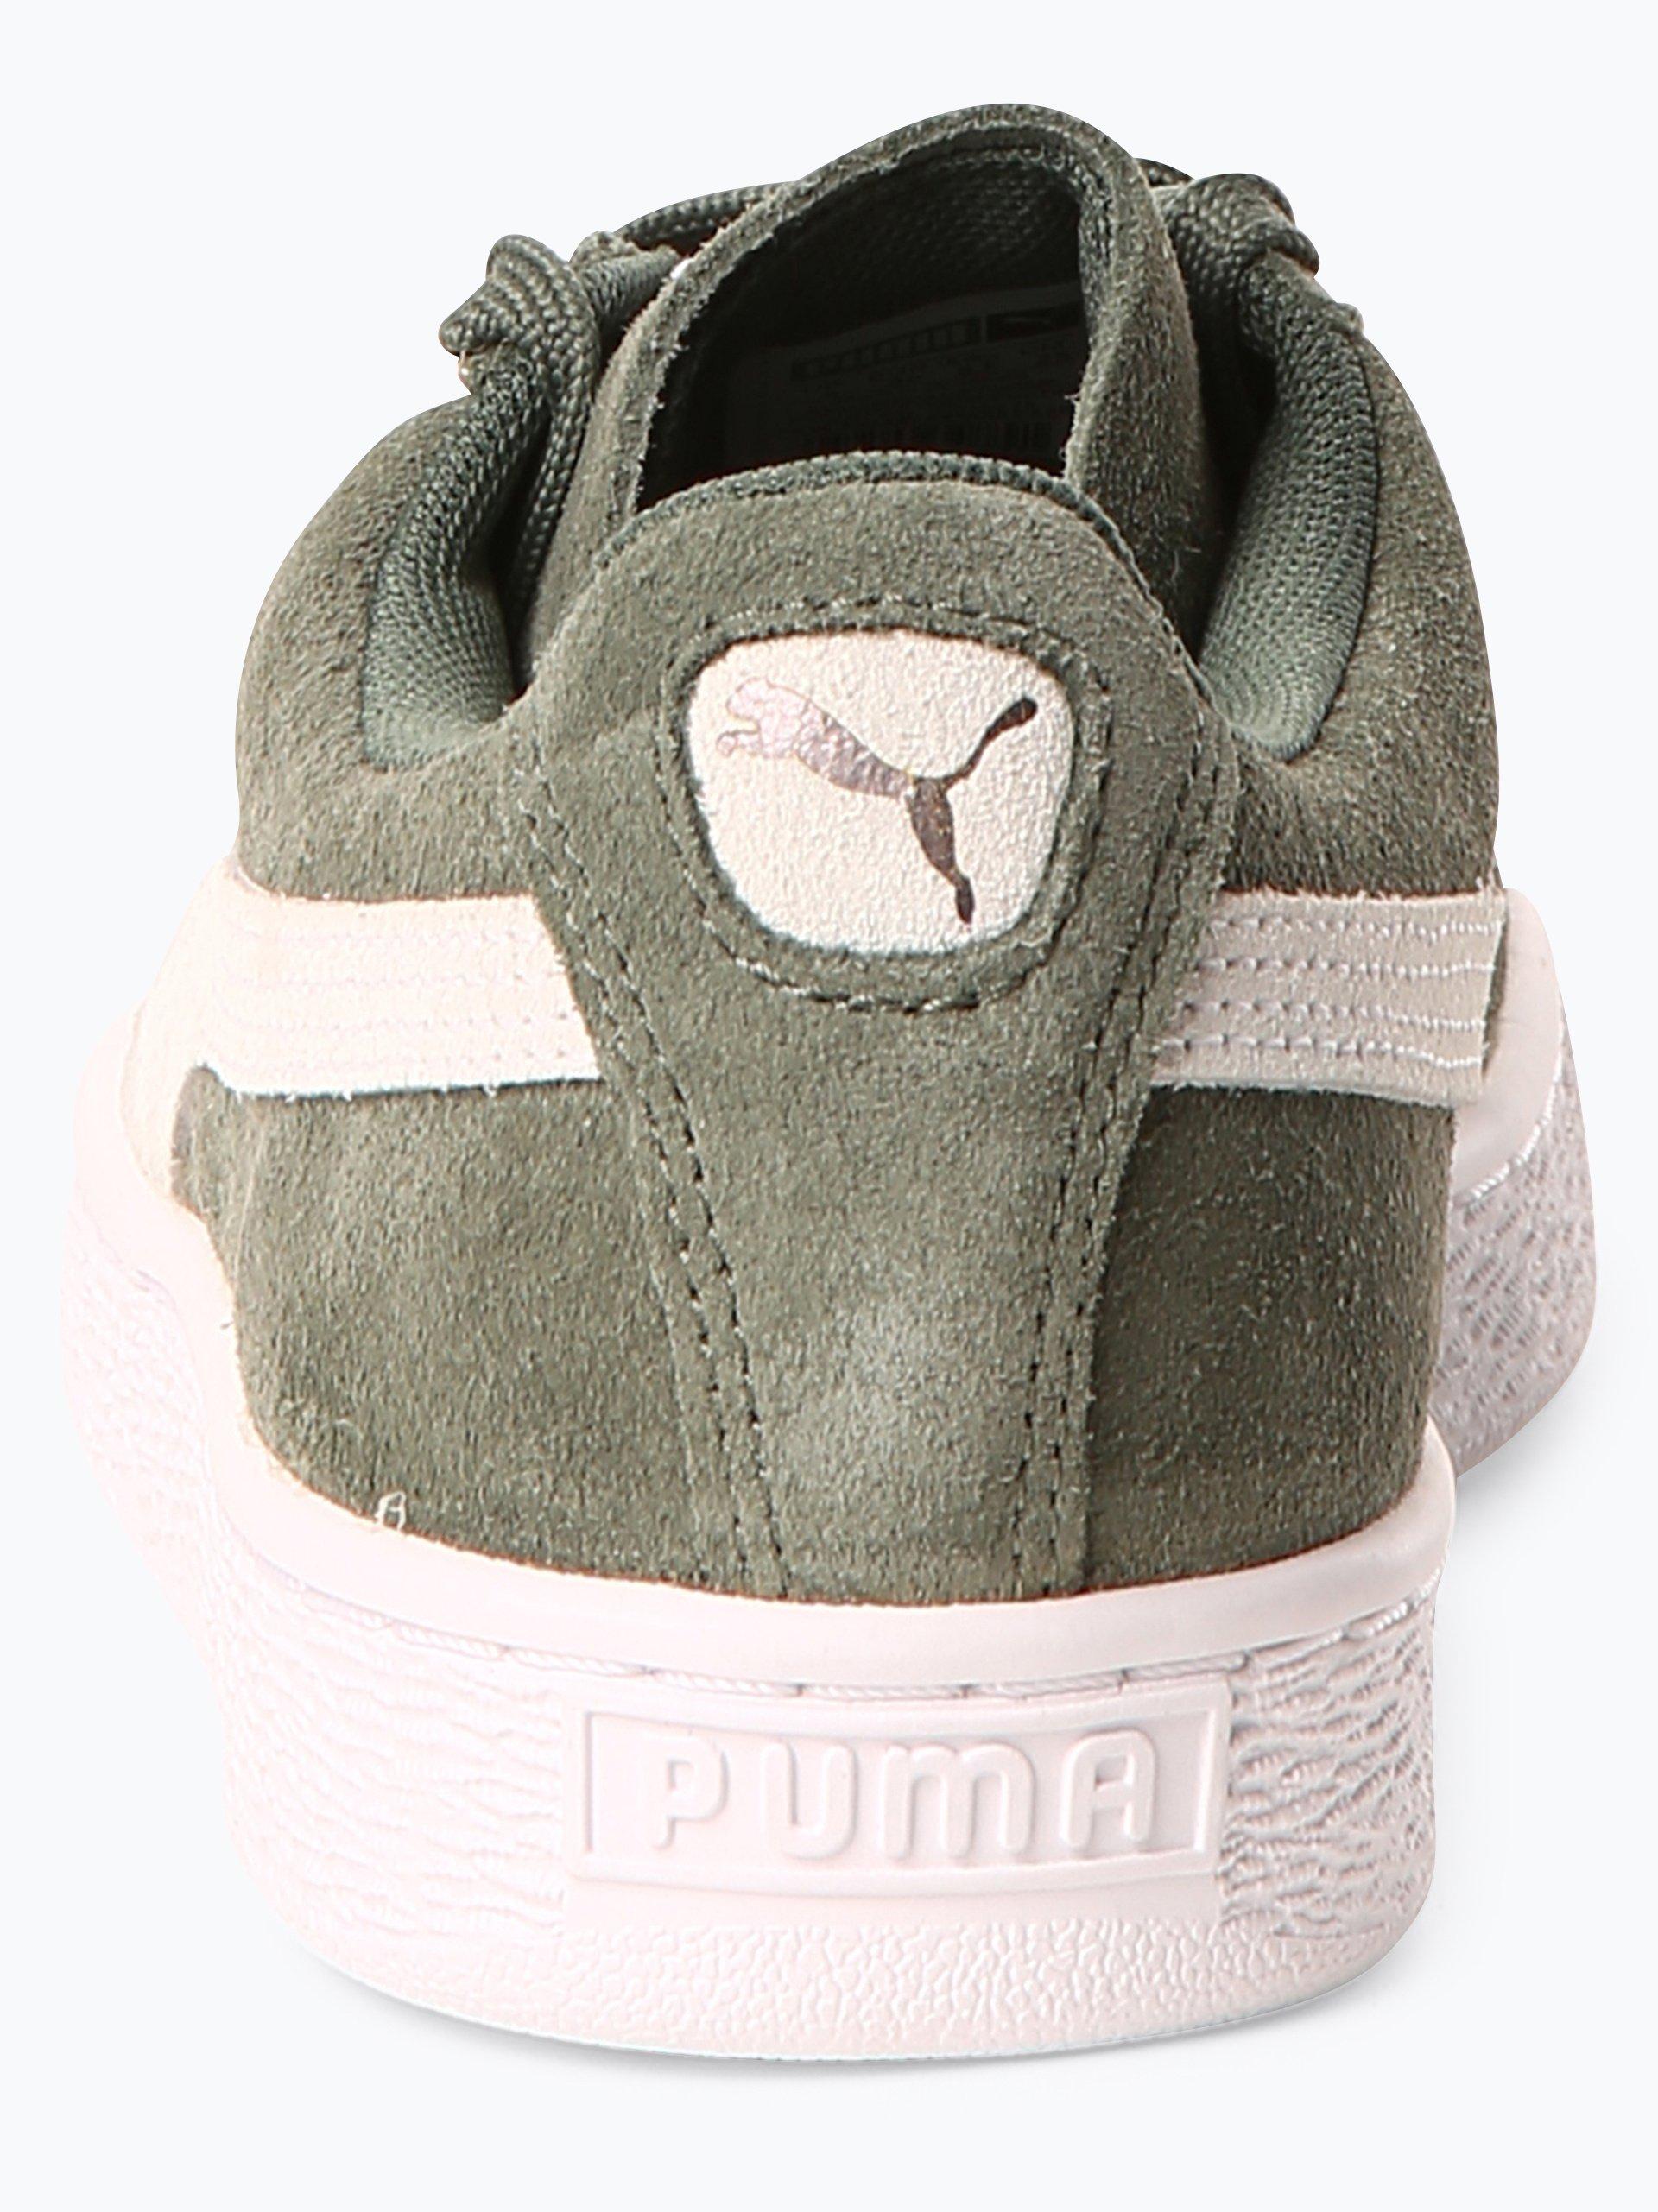 Puma Damskie tenisówki ze skóry – Laurel Wreath